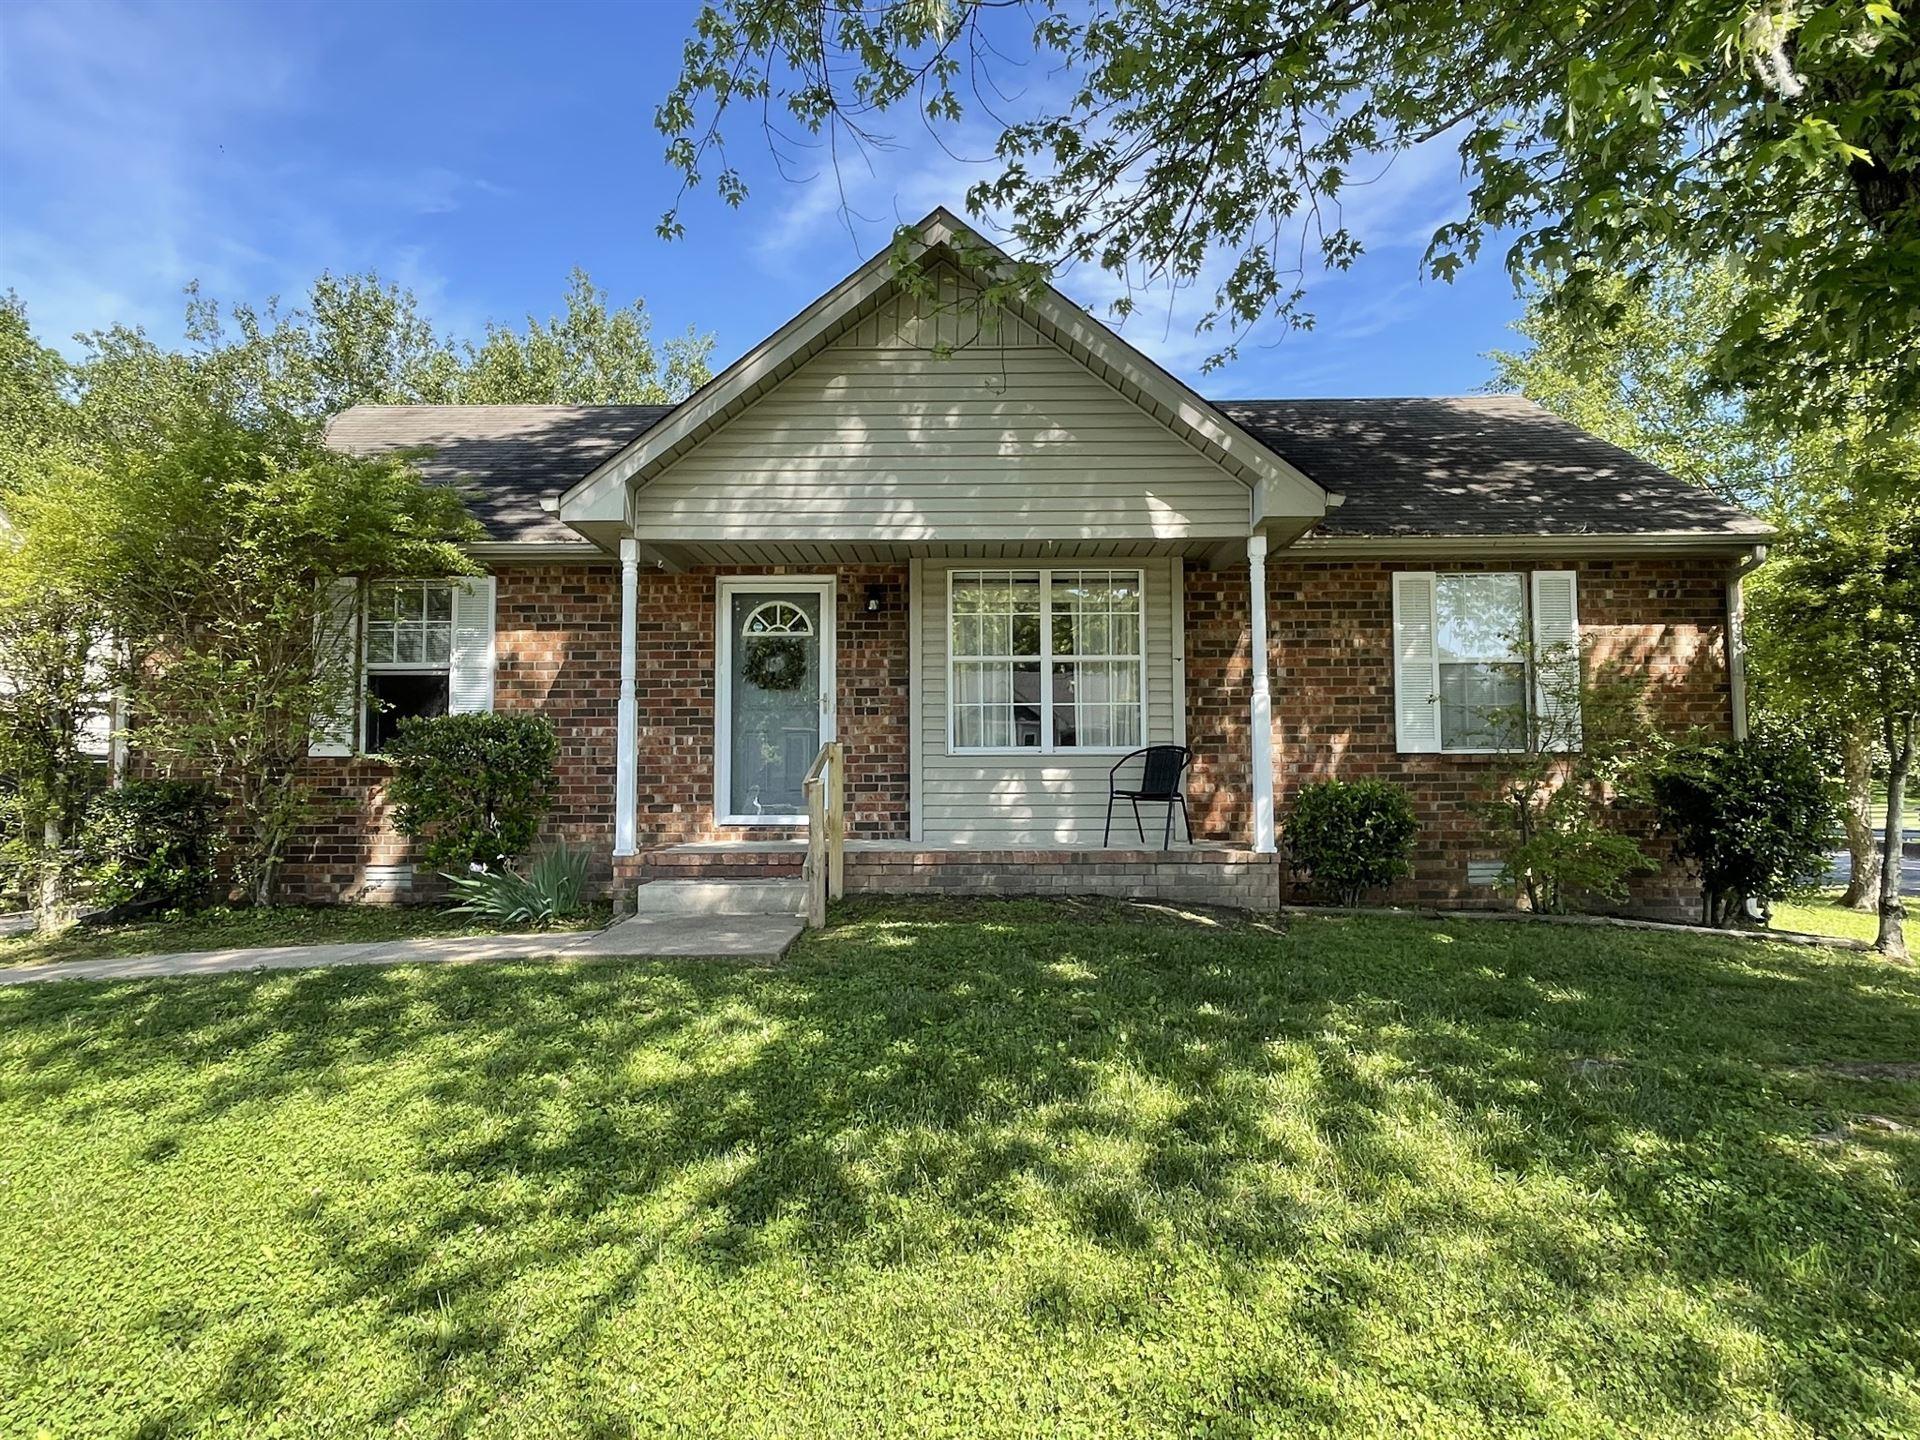 100 Scotts Creek Cir, Hermitage, TN 37076 - MLS#: 2251719